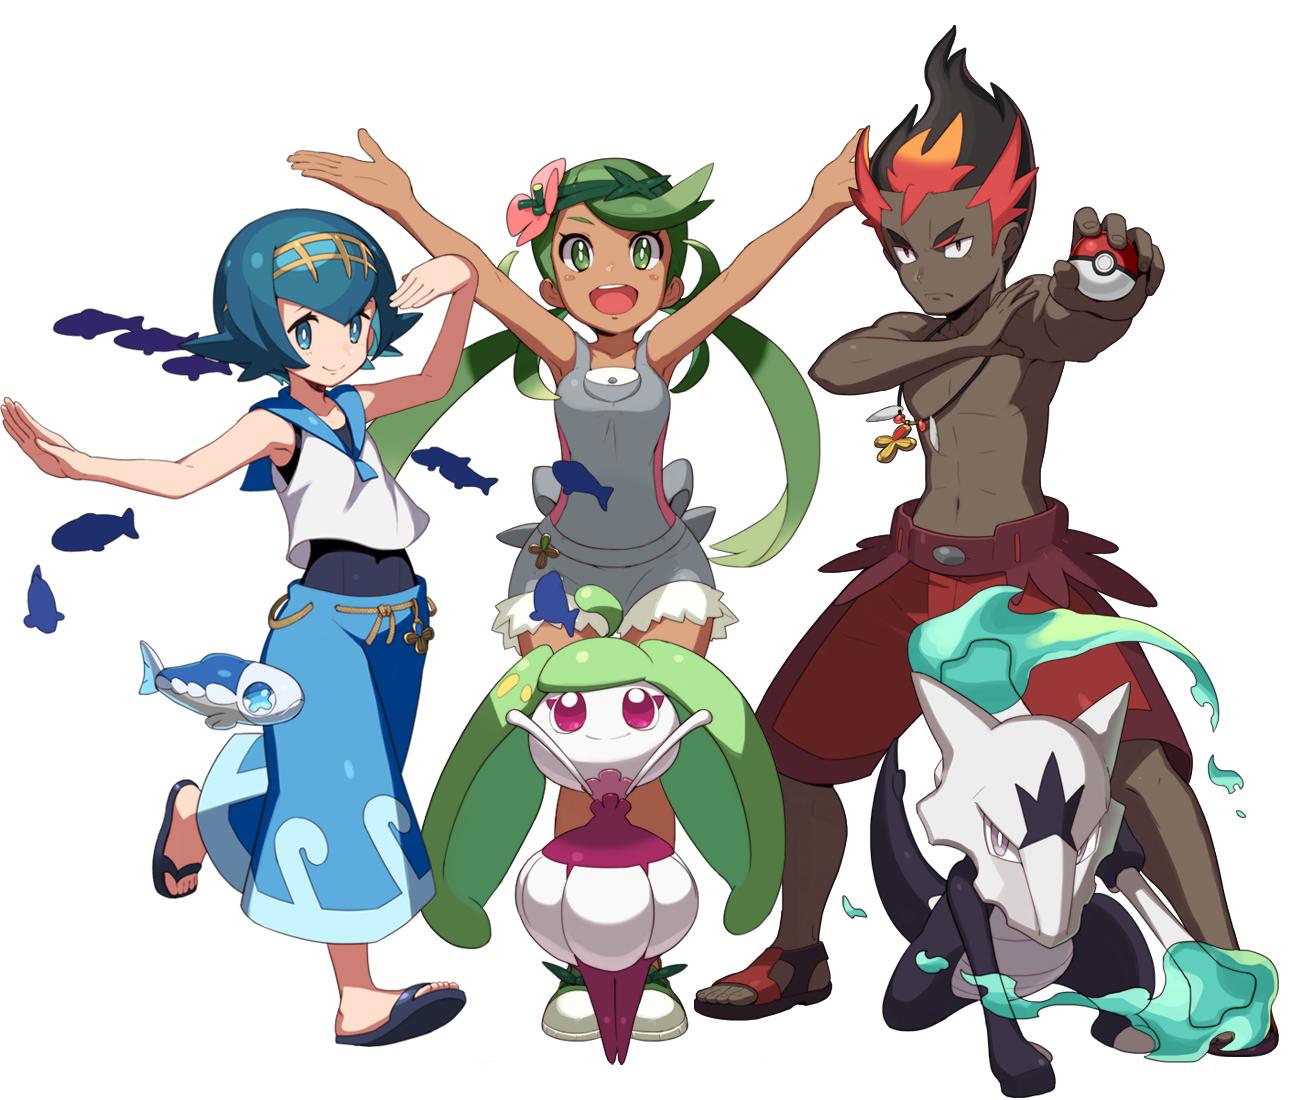 Tags Anime Pixiv Id 3239663 Pokemon Wishiwashi Marowak Kaki Mao Pokemon Pokemon Heroes Pokemon Moon Pokemon Alola